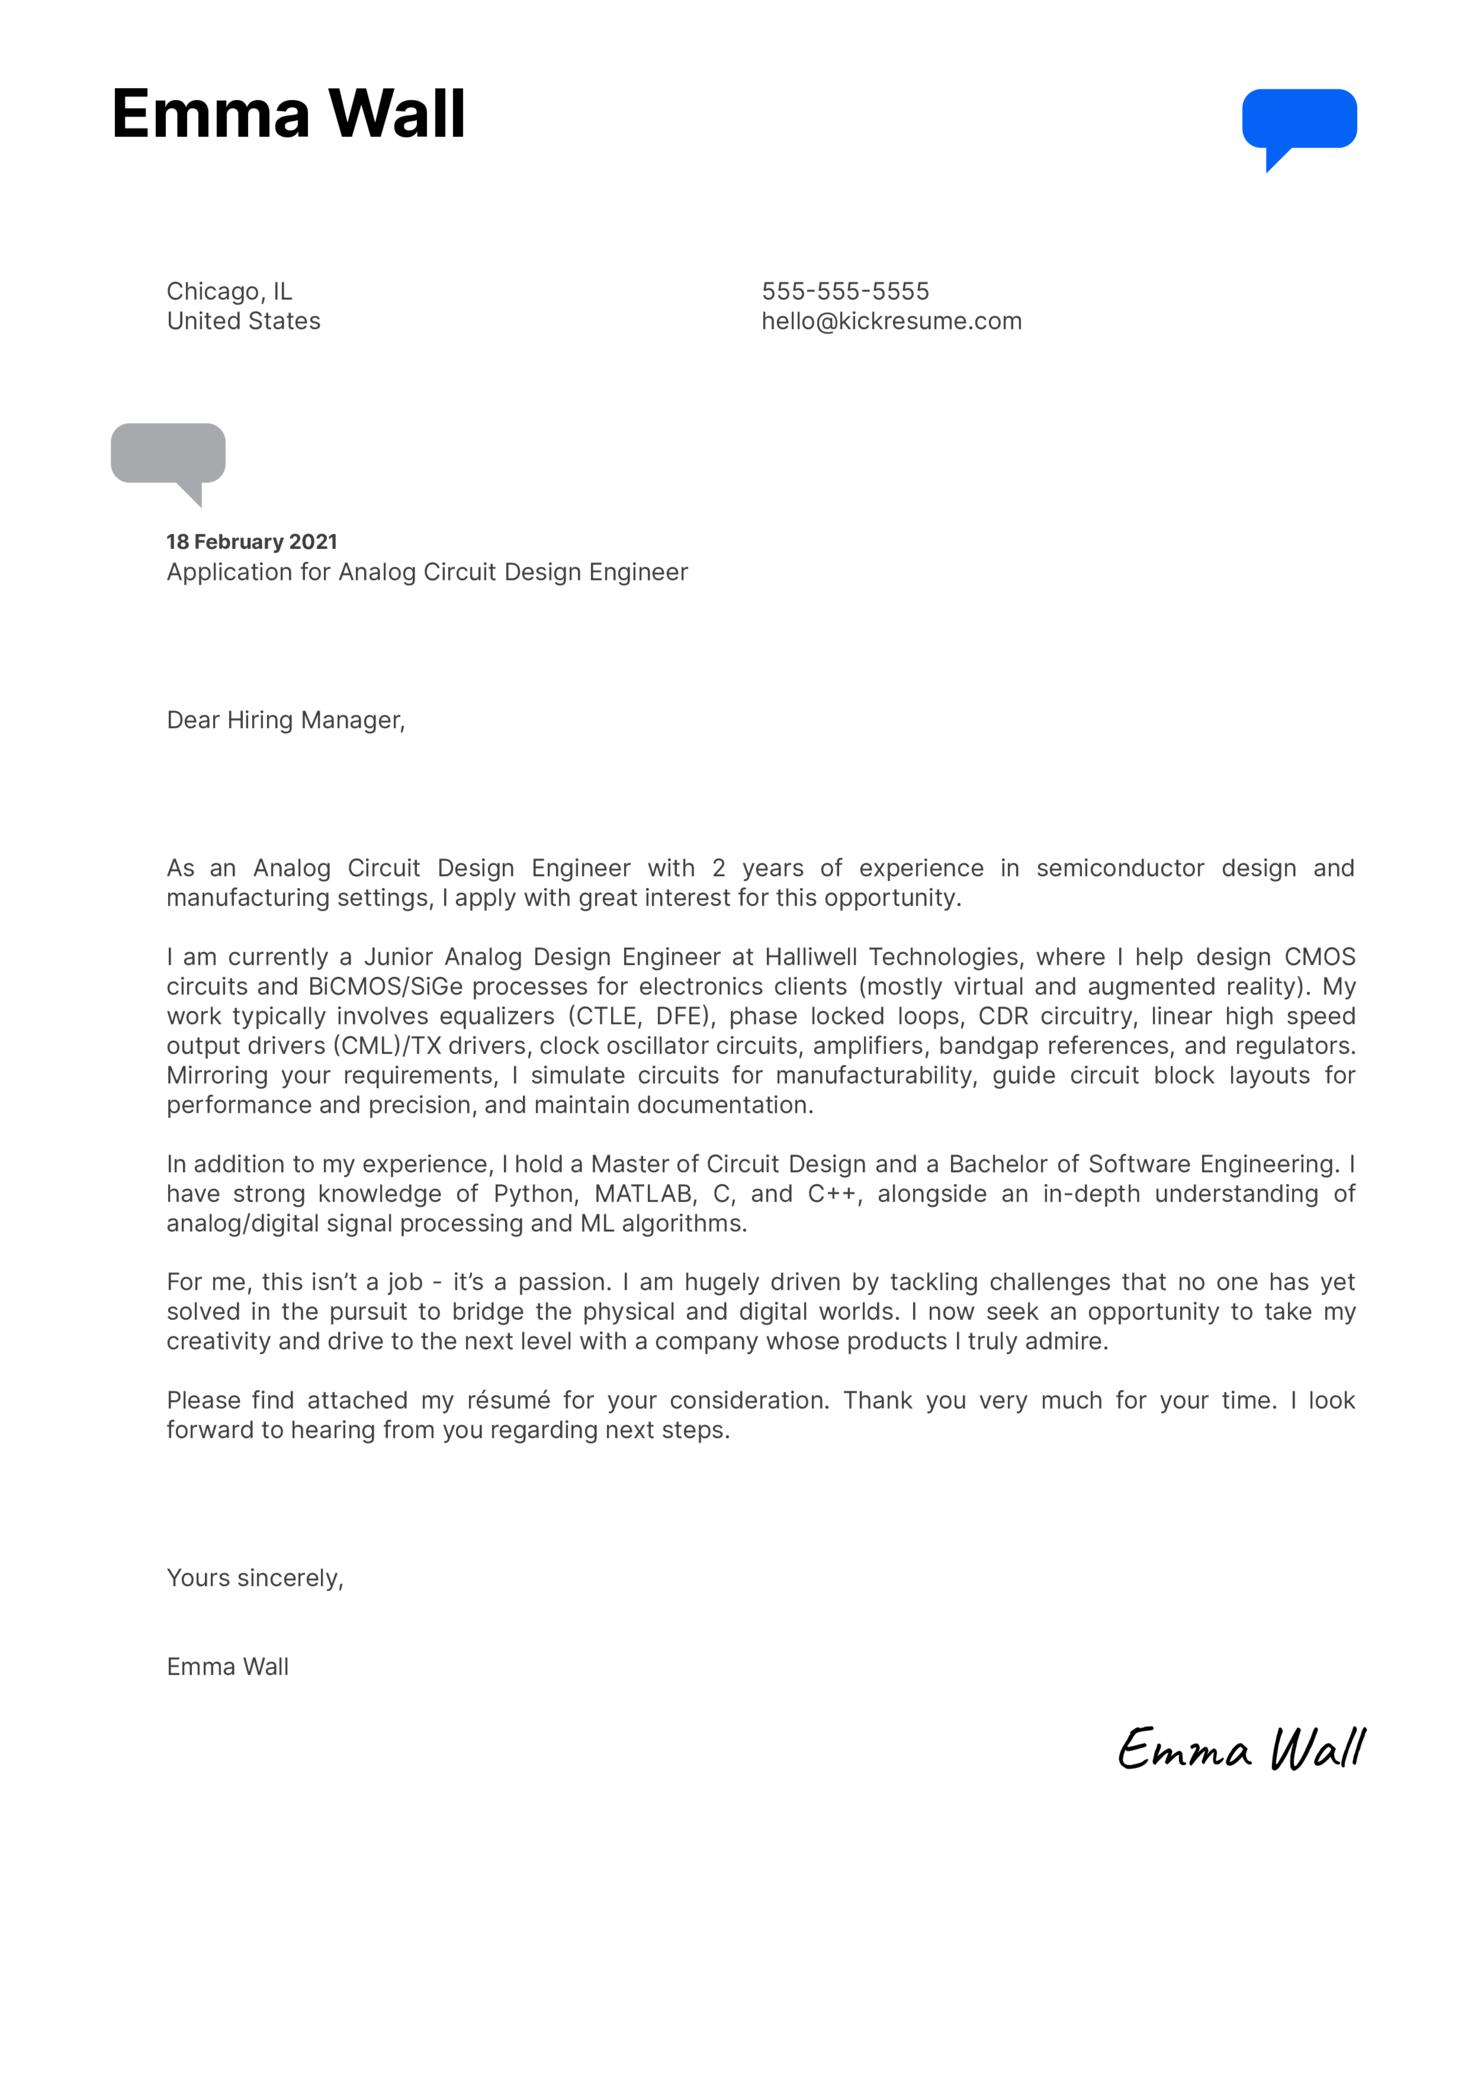 Analog Circuit Design Engineer Cover Letter Sample